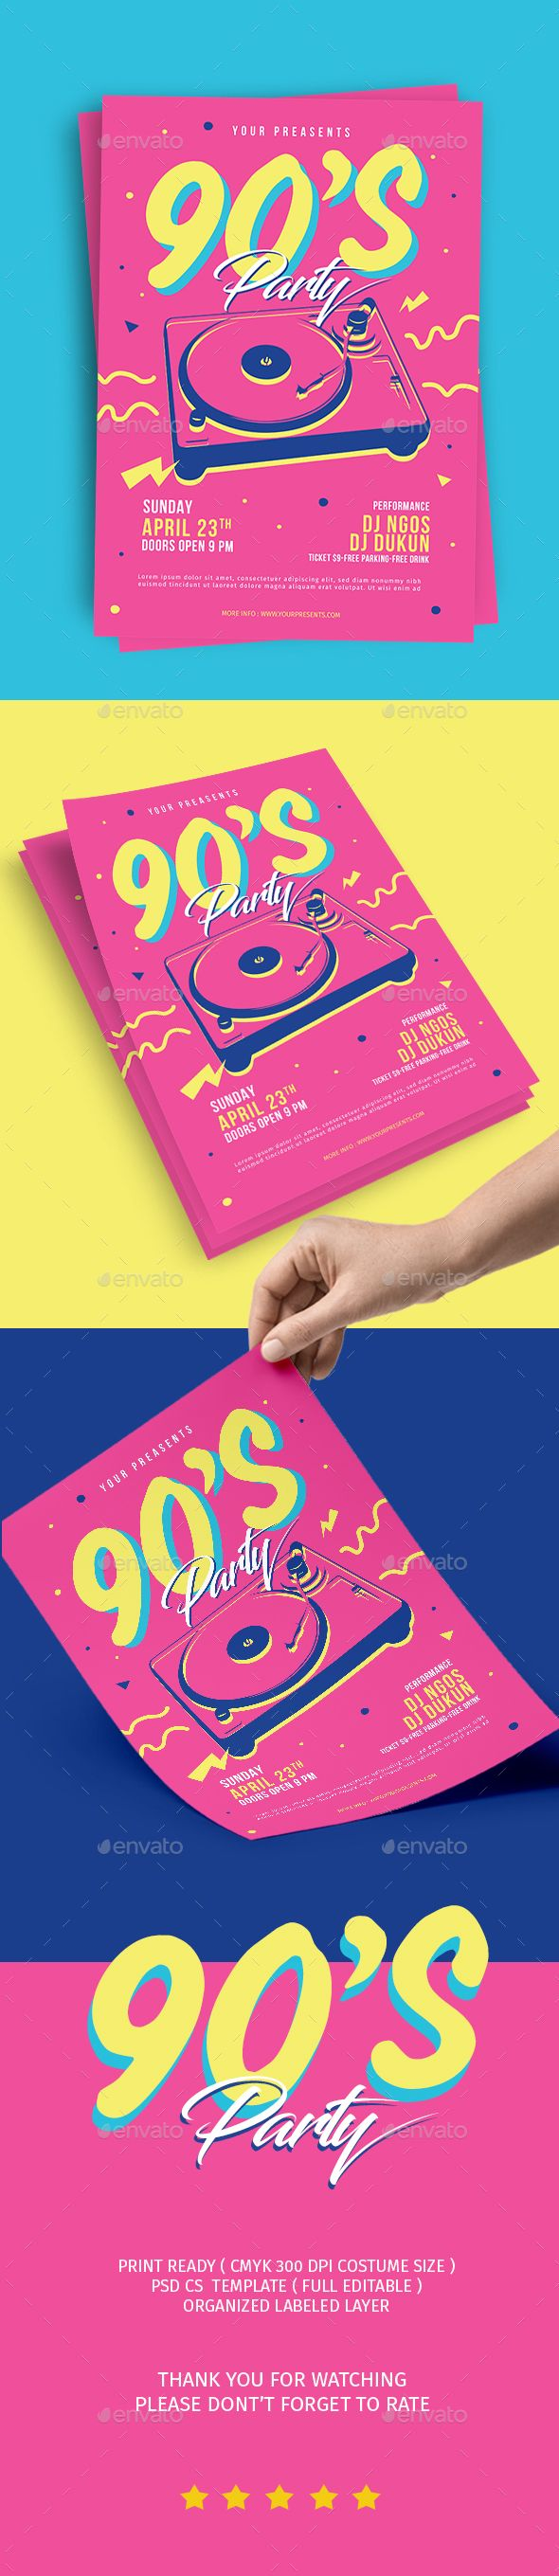 90's Music Event Flyer Template PSD